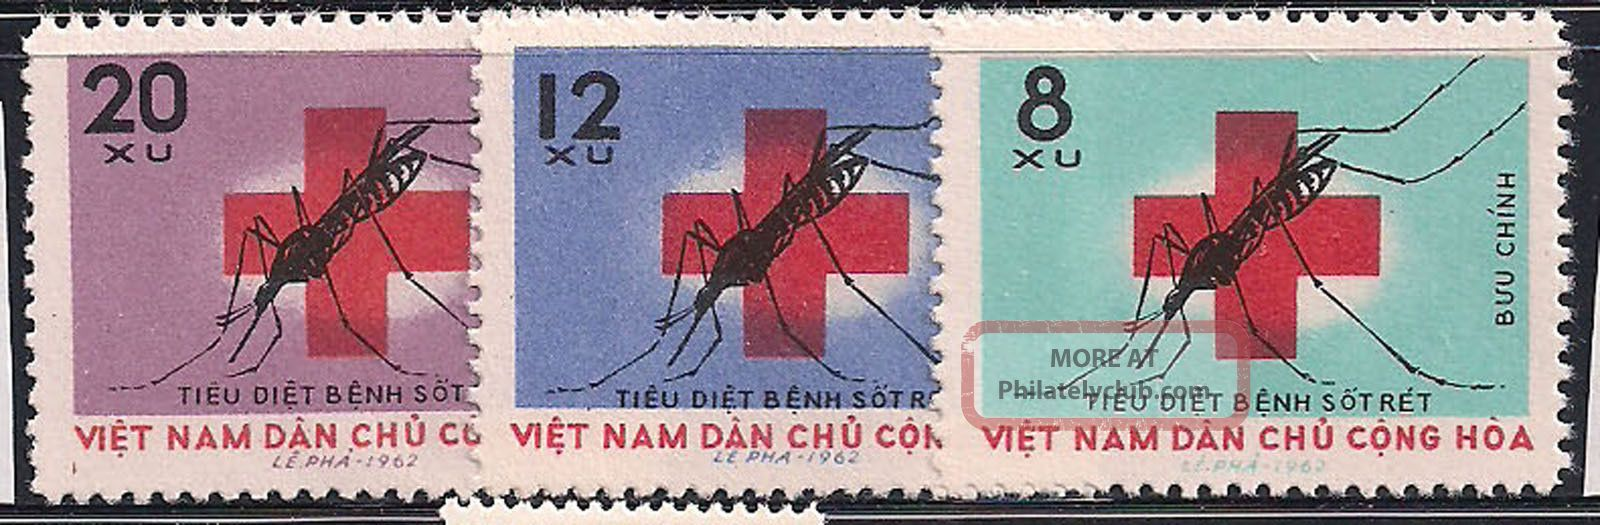 Vietnam - 1962 Insects - Vf 220 - 2 Animal Kingdom photo